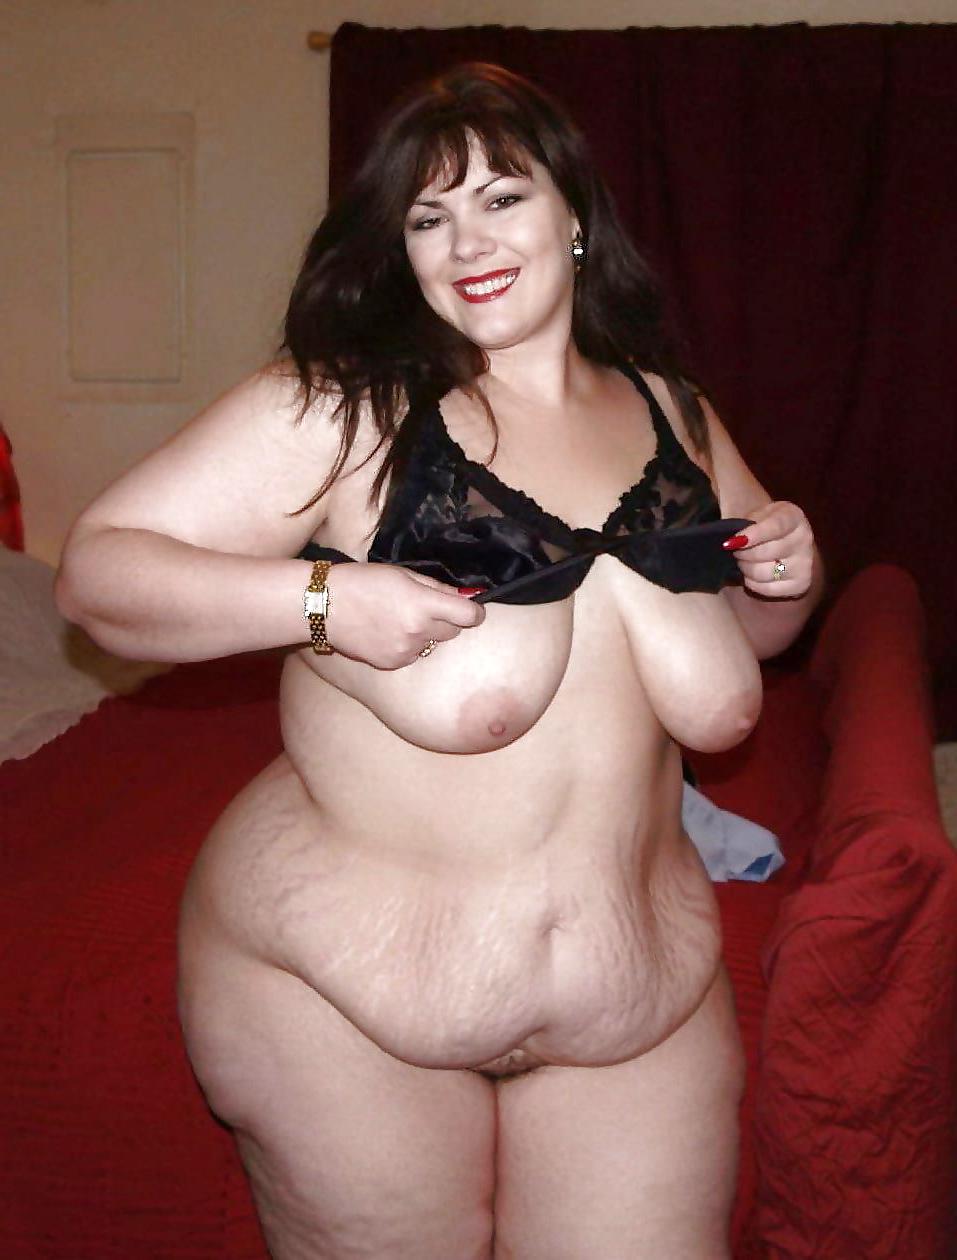 Porn free chubby Sweet Show